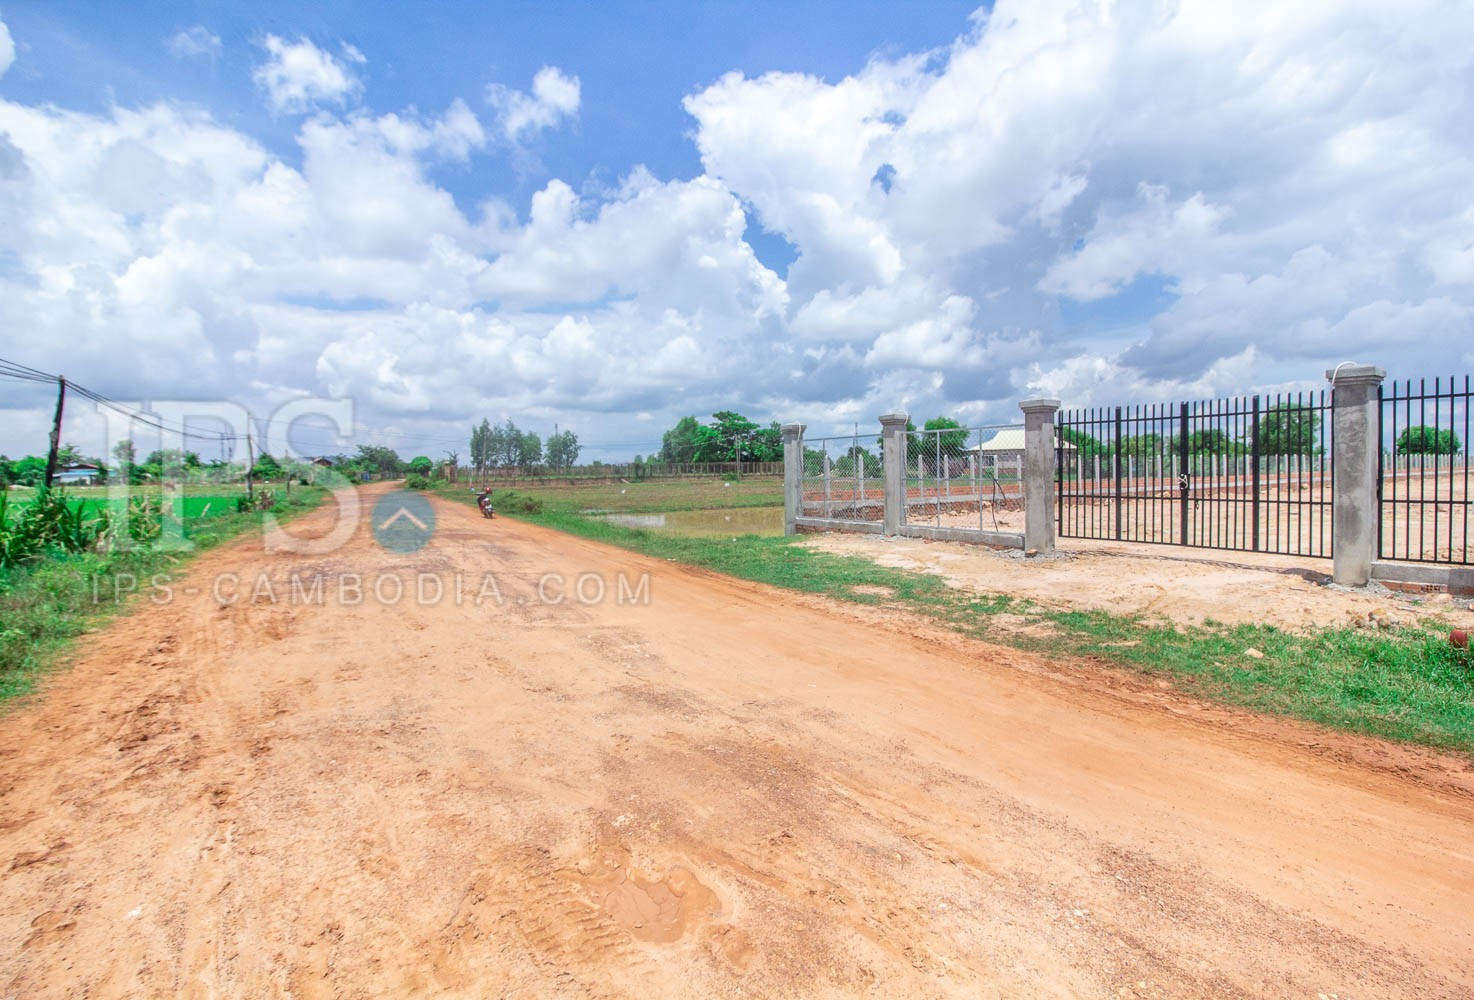 1307 Sqm Land For Sale - Svay Prey, Siem Reap